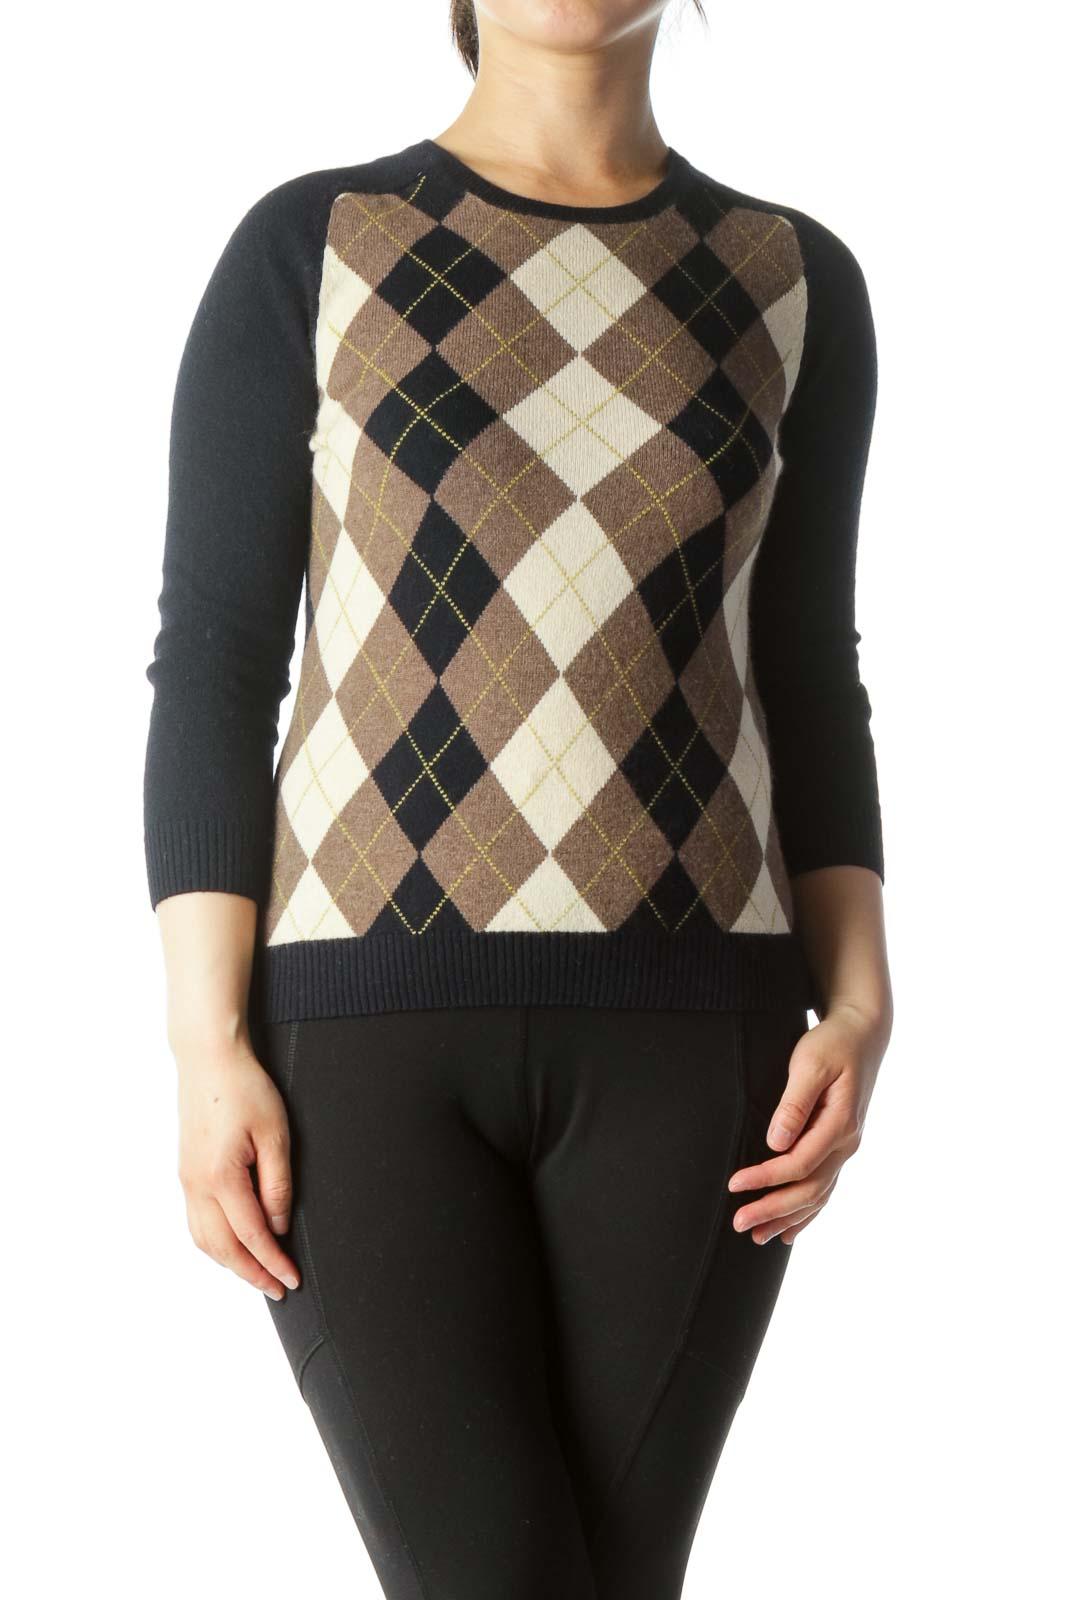 Blue Brown Beige Patterned Round Neck Sweater